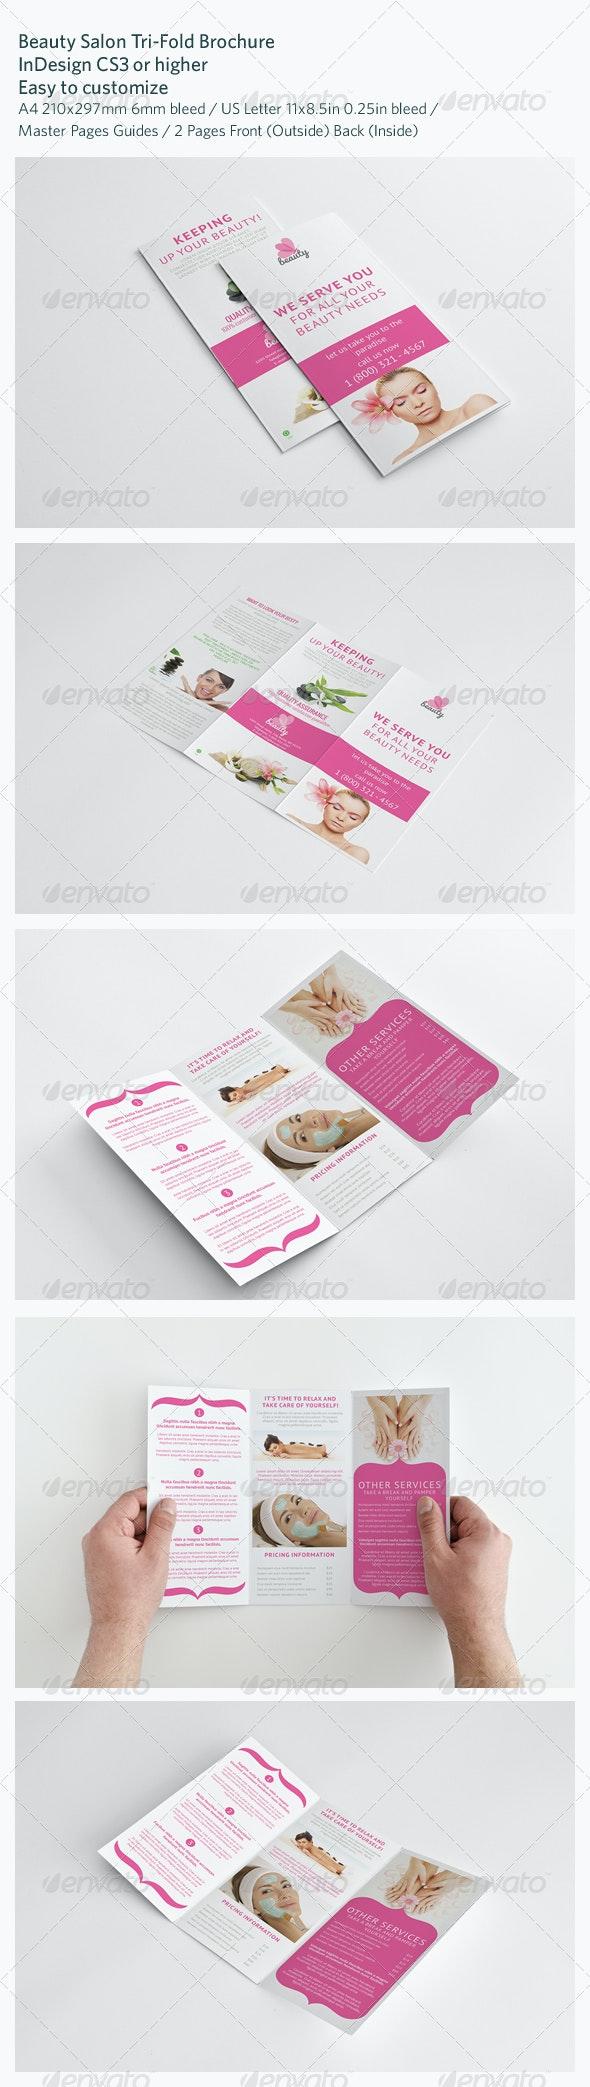 Beauty Salon Tri-Fold Brochure - Brochures Print Templates